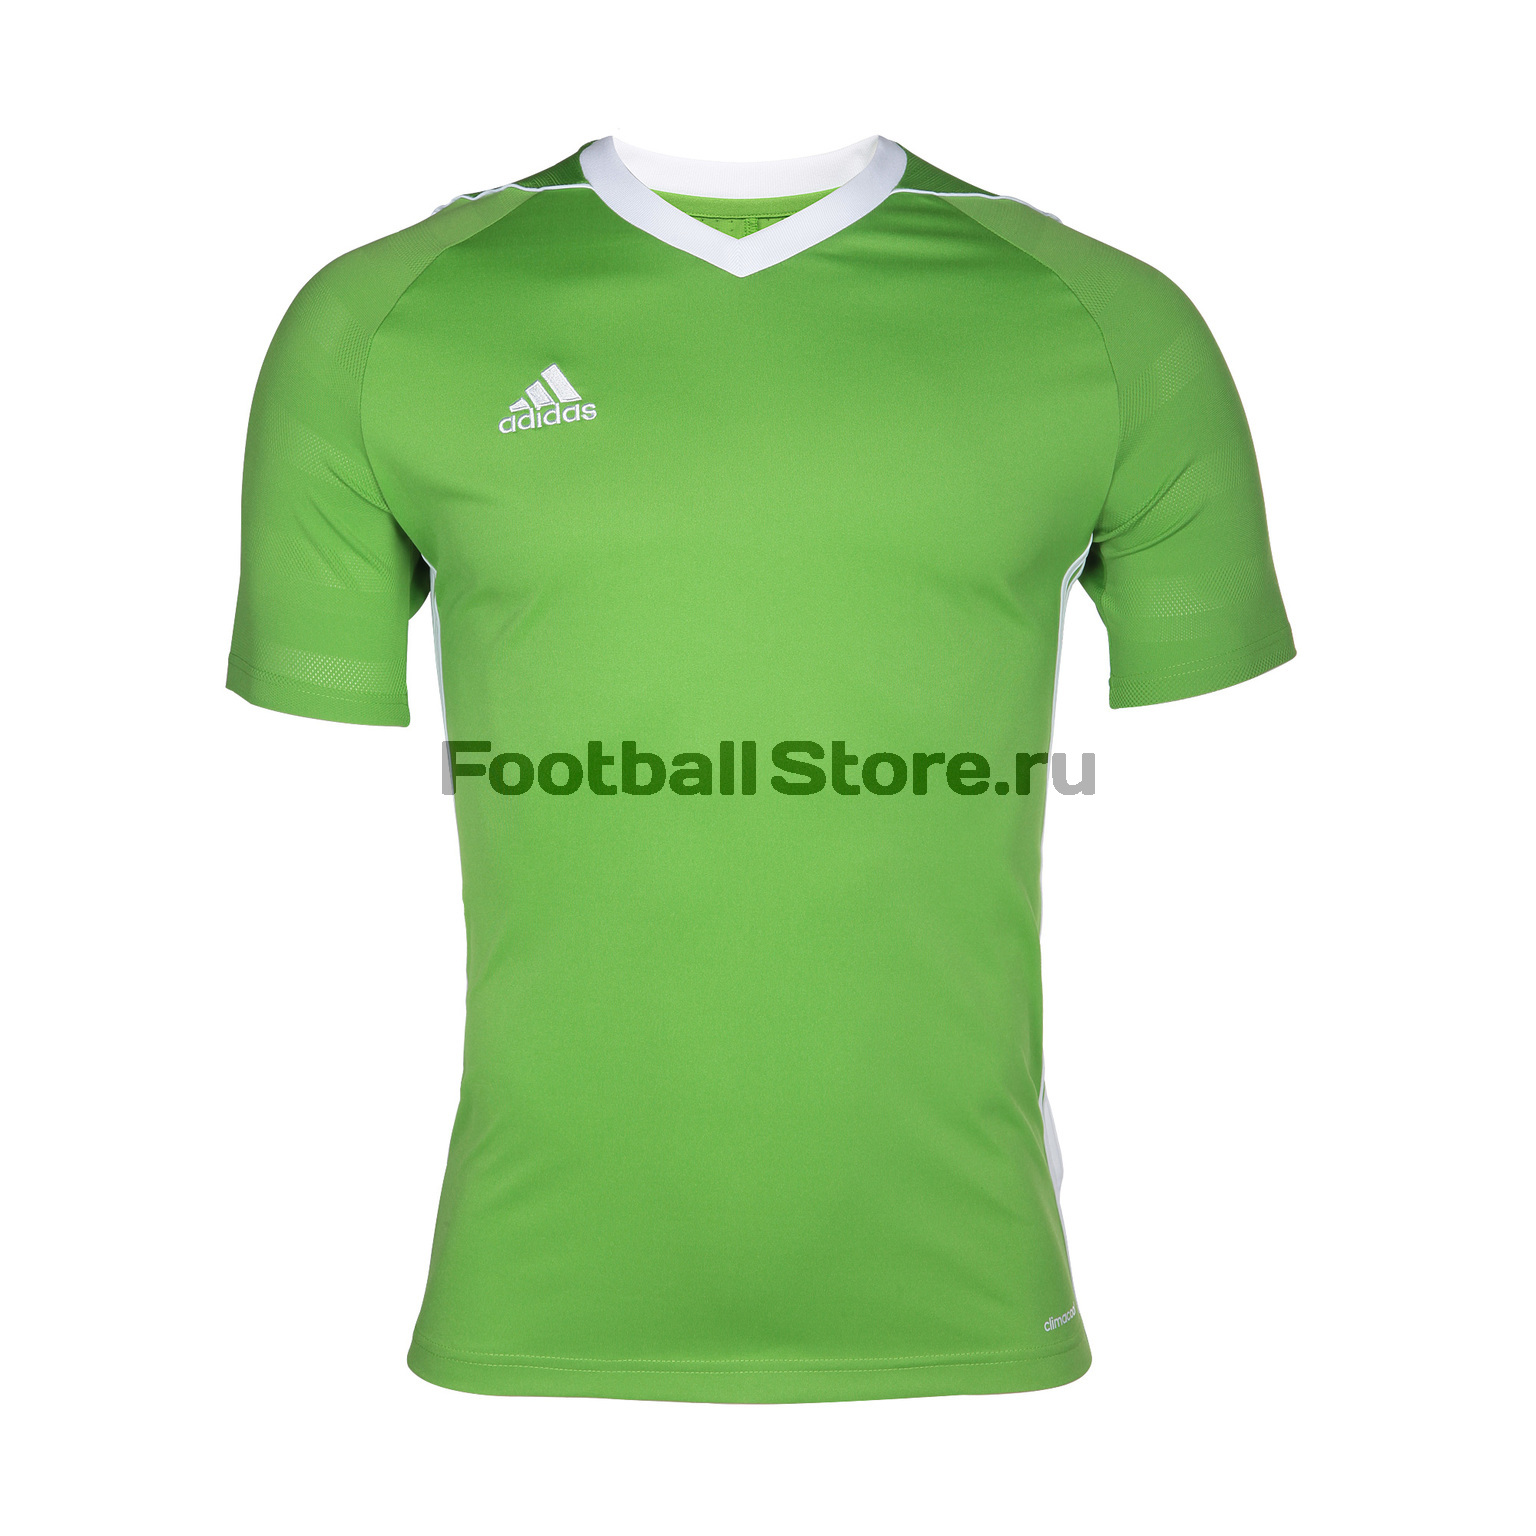 Футболка тренировочная Adidas Tiro17 JSY BK5428 футболка игровая adidas tanip cc jsy az9712